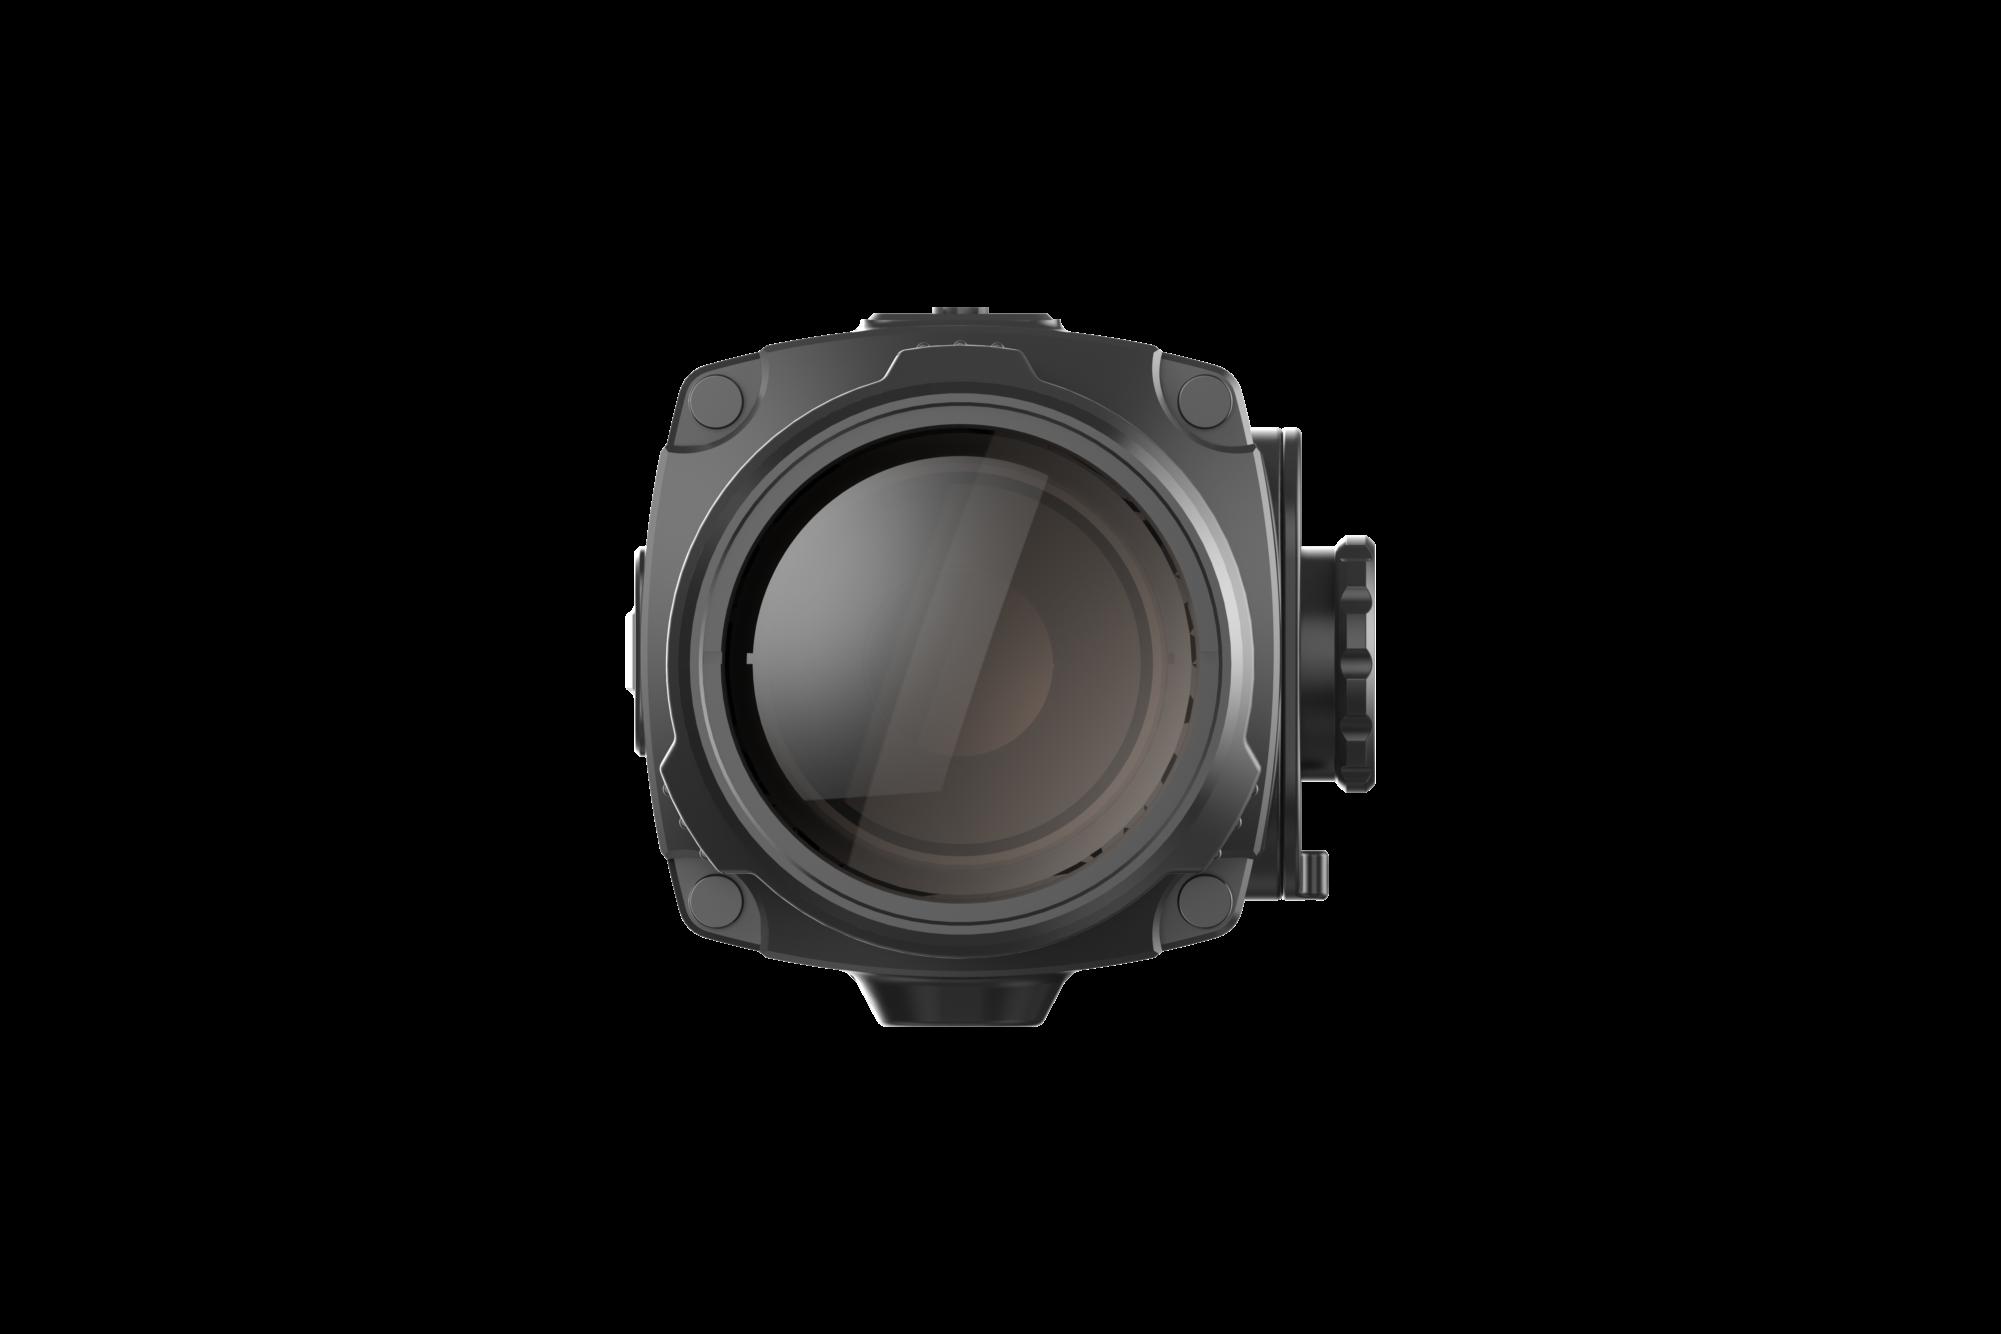 Xeye CL42 - Dual-Use Wärmebildvorsatzgerät (Modell 2021)